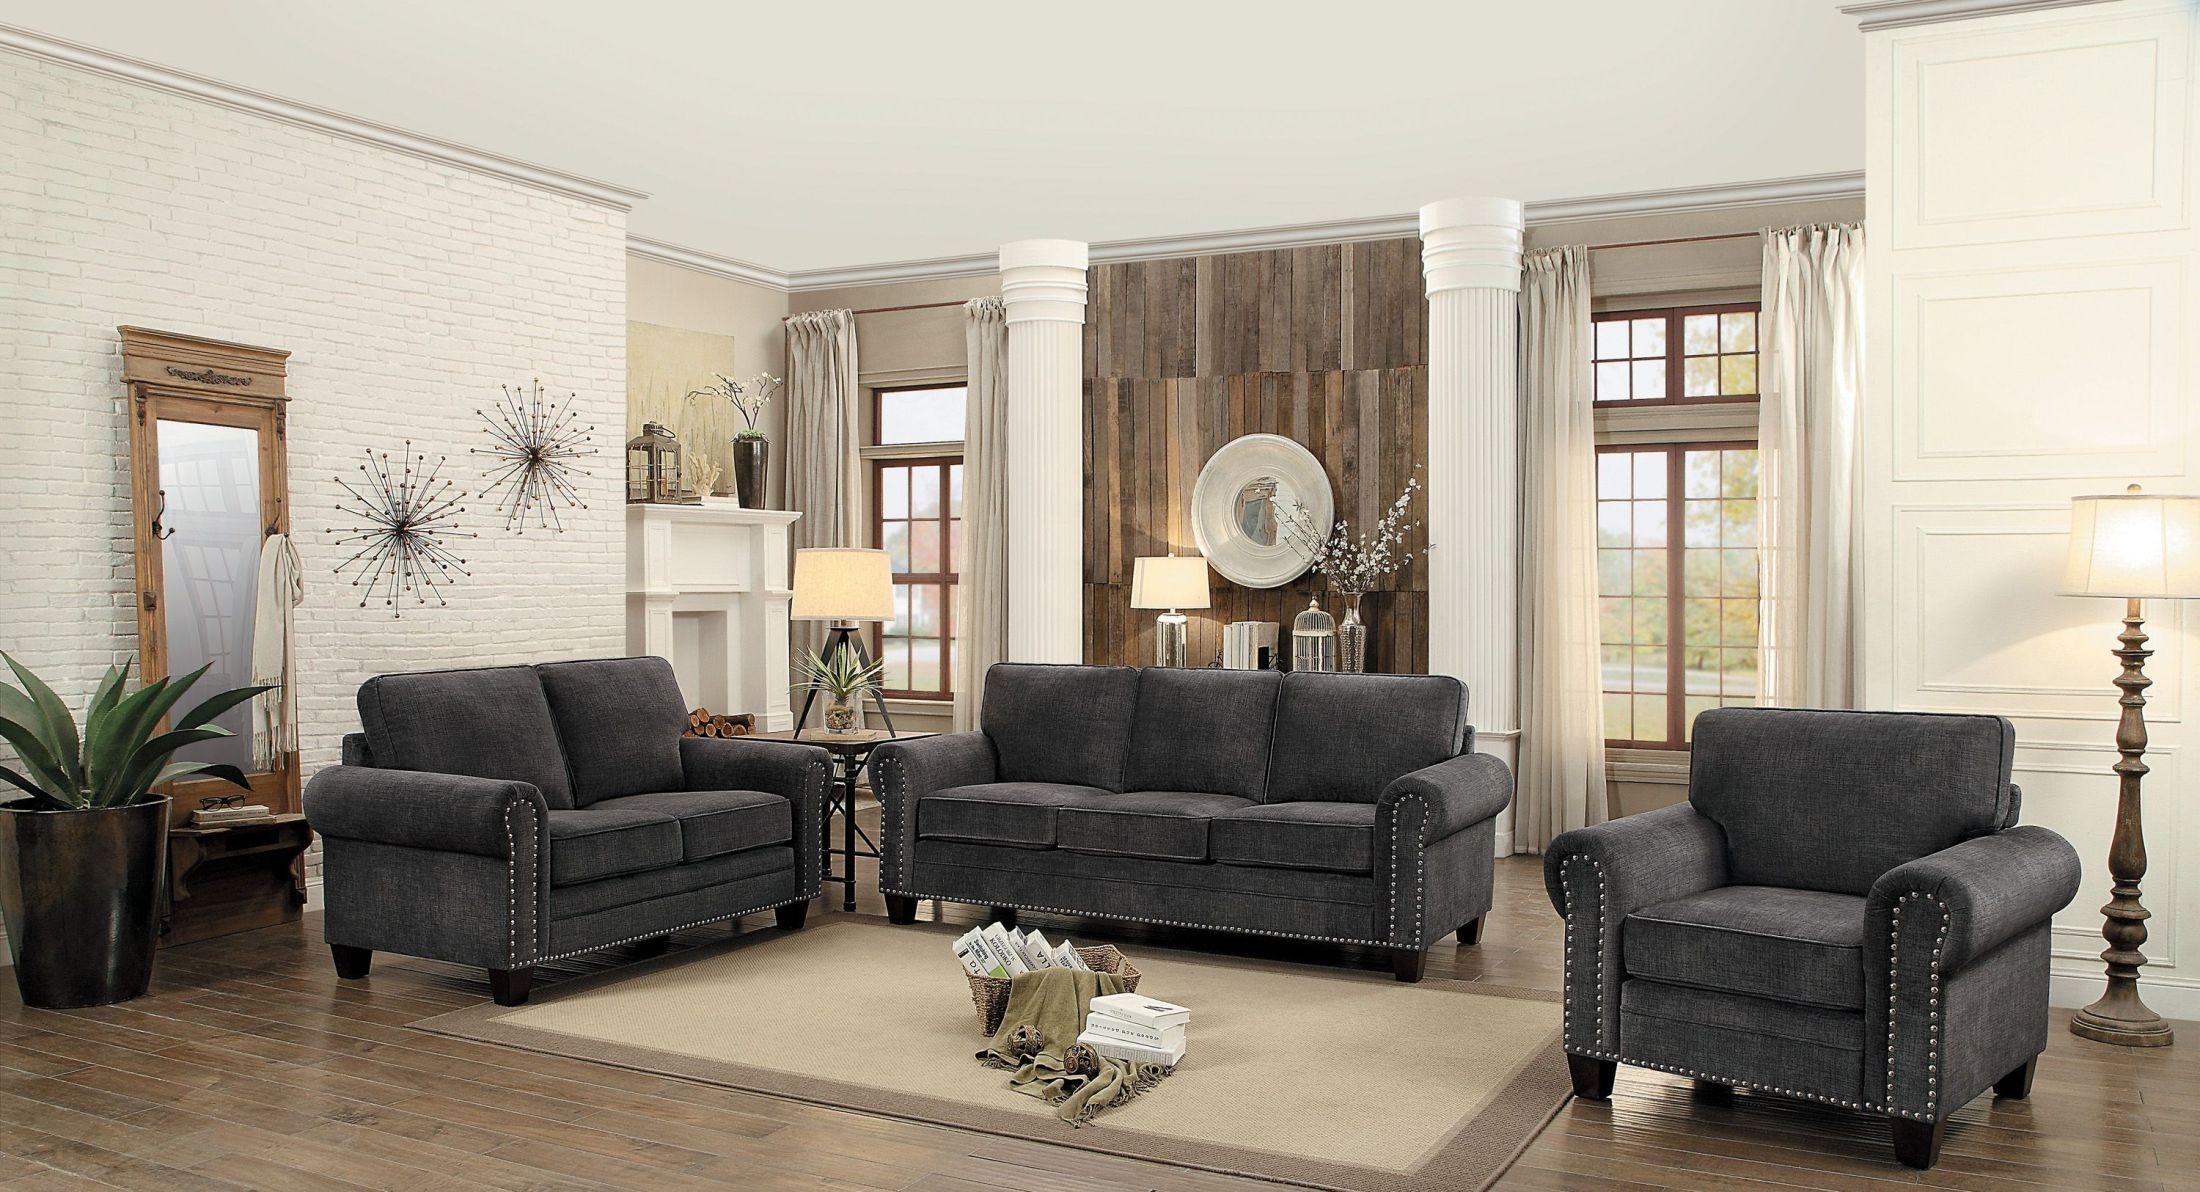 Cornelia Dark Grey Living Room Set from Homelegance